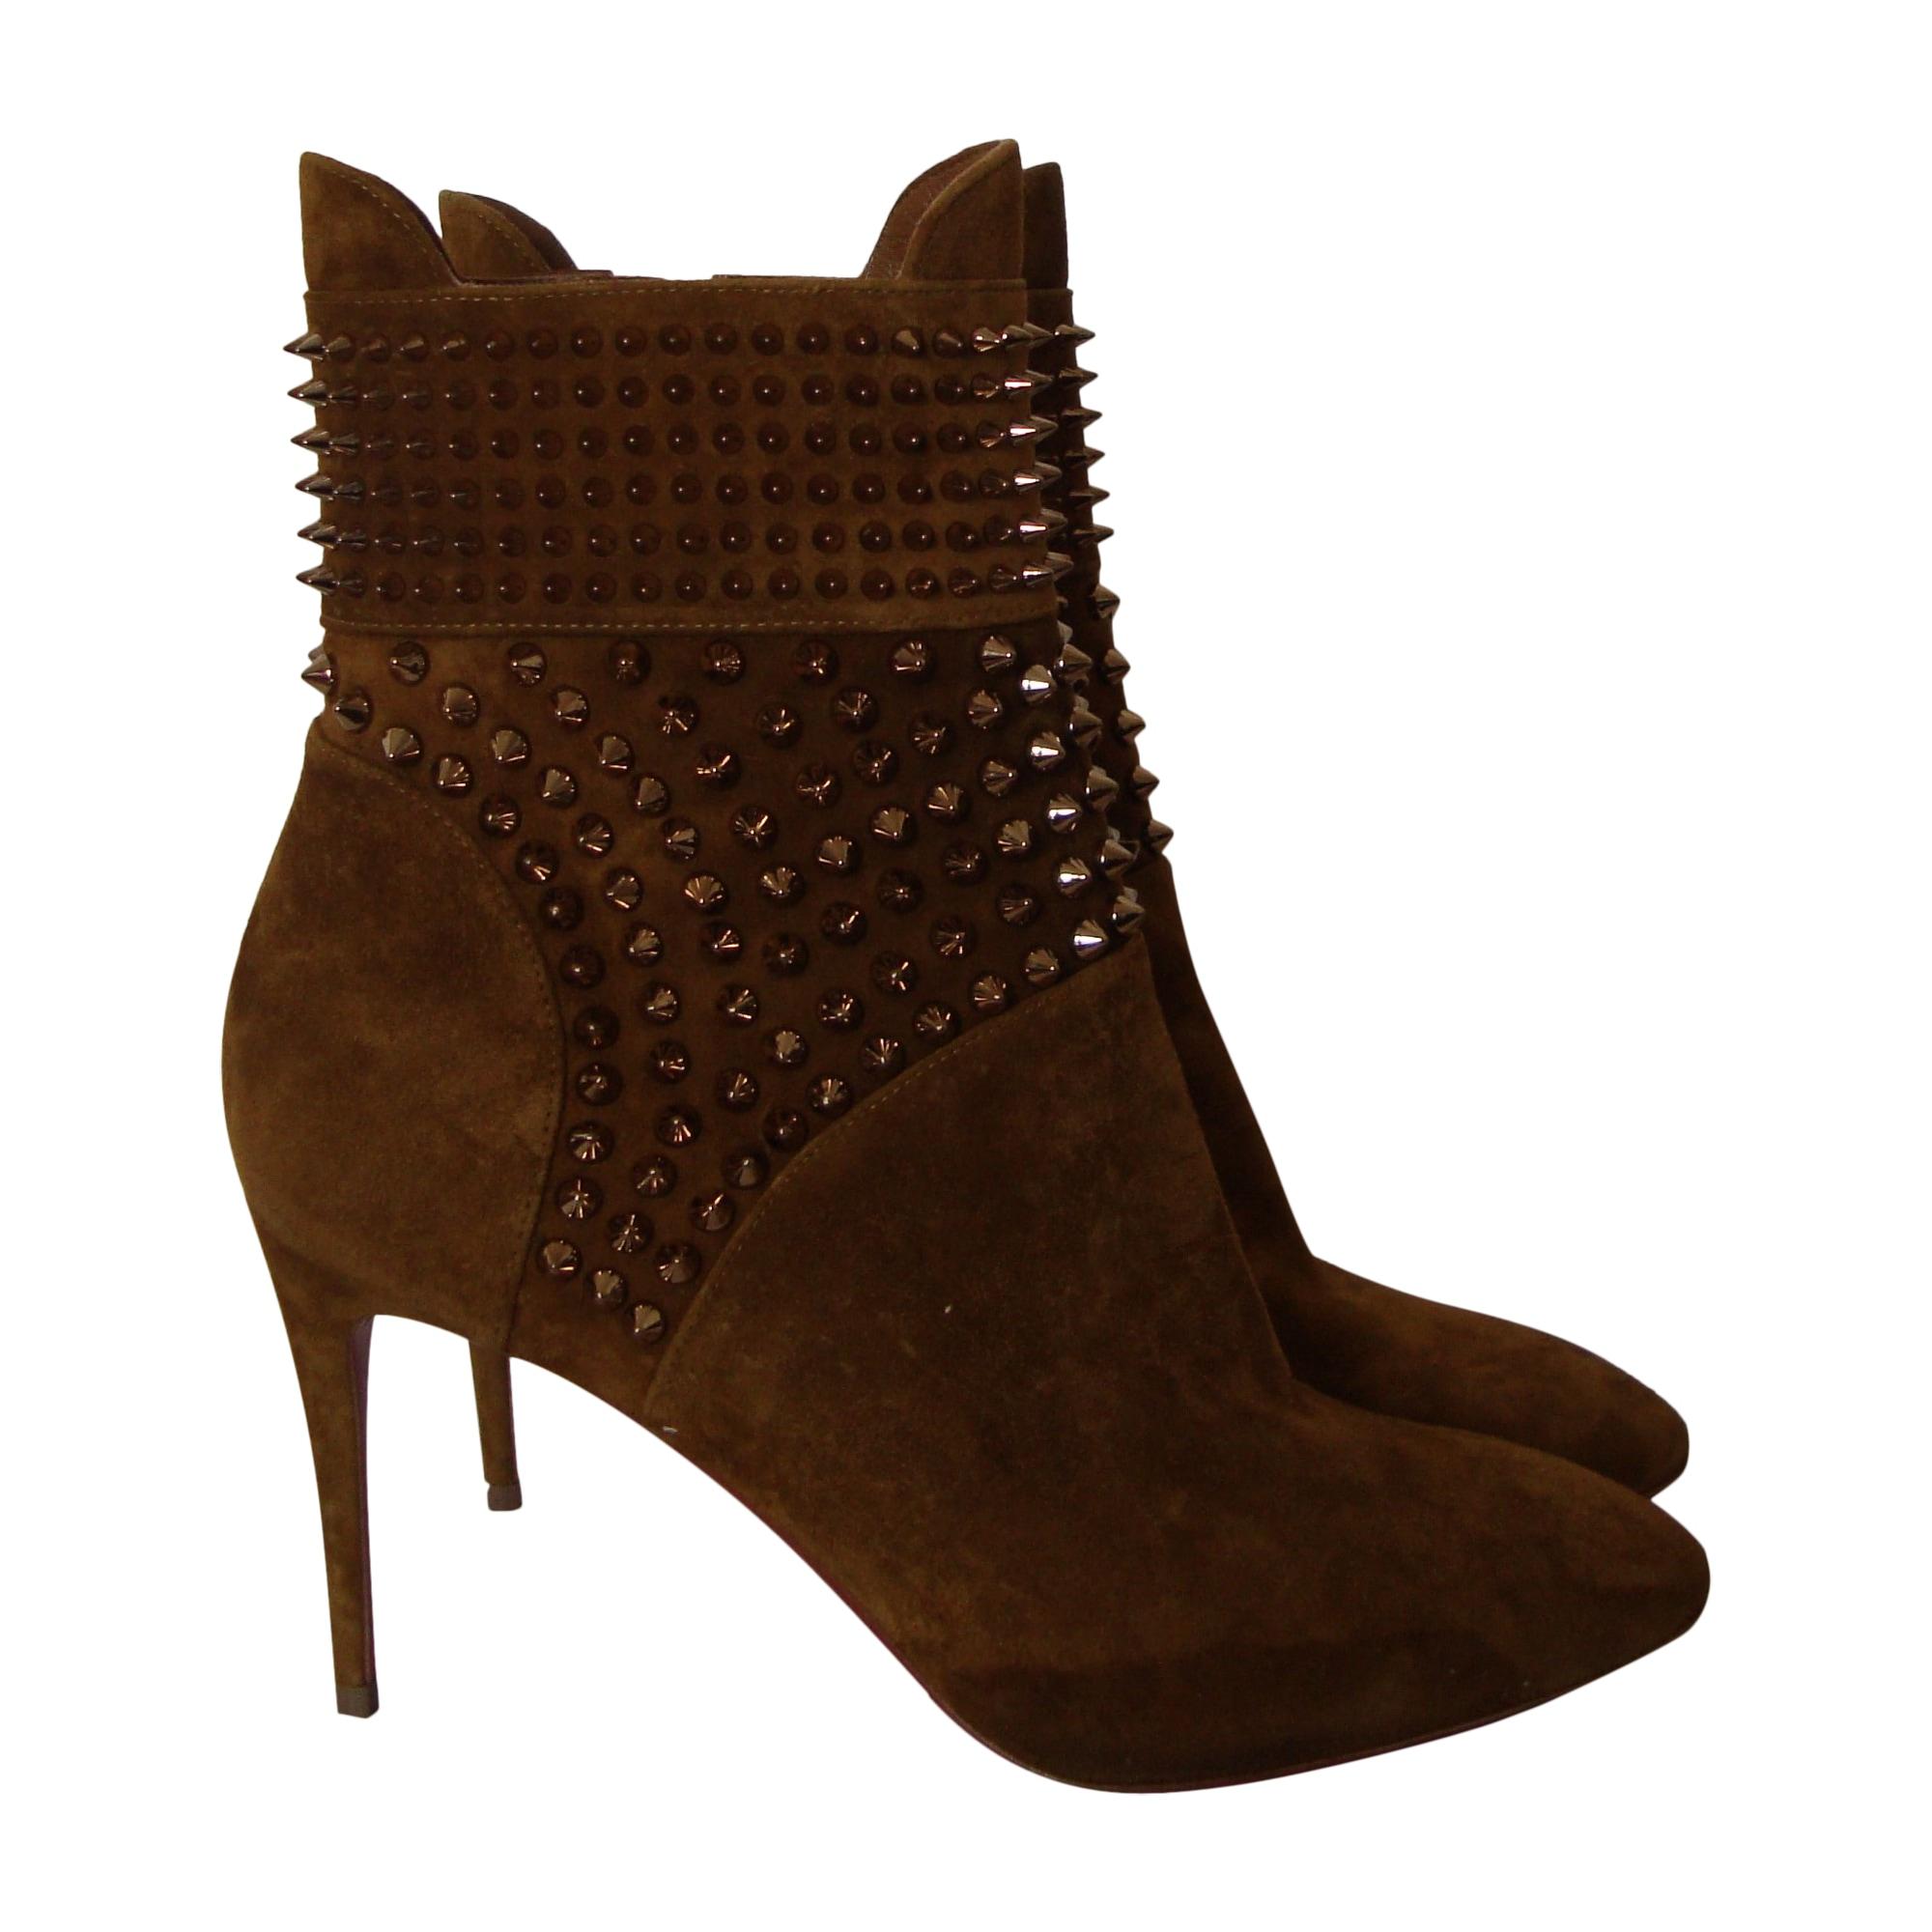 Bottines & low boots à talons CHRISTIAN LOUBOUTIN Beige, camel